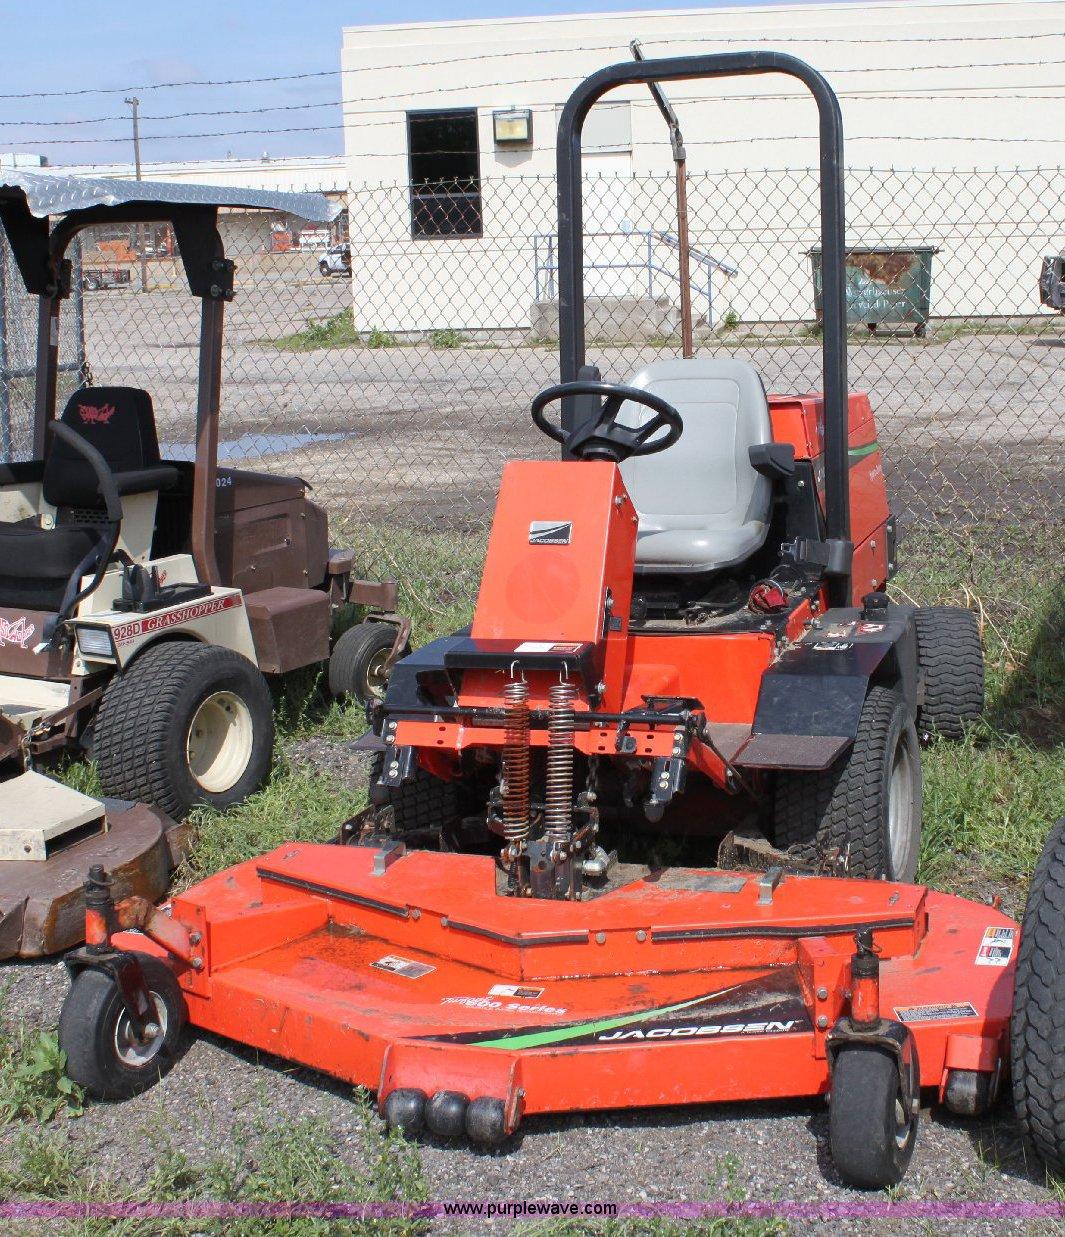 Jacobsen Turfcat 628d Riding Lawn Mower Item 6236 5 18